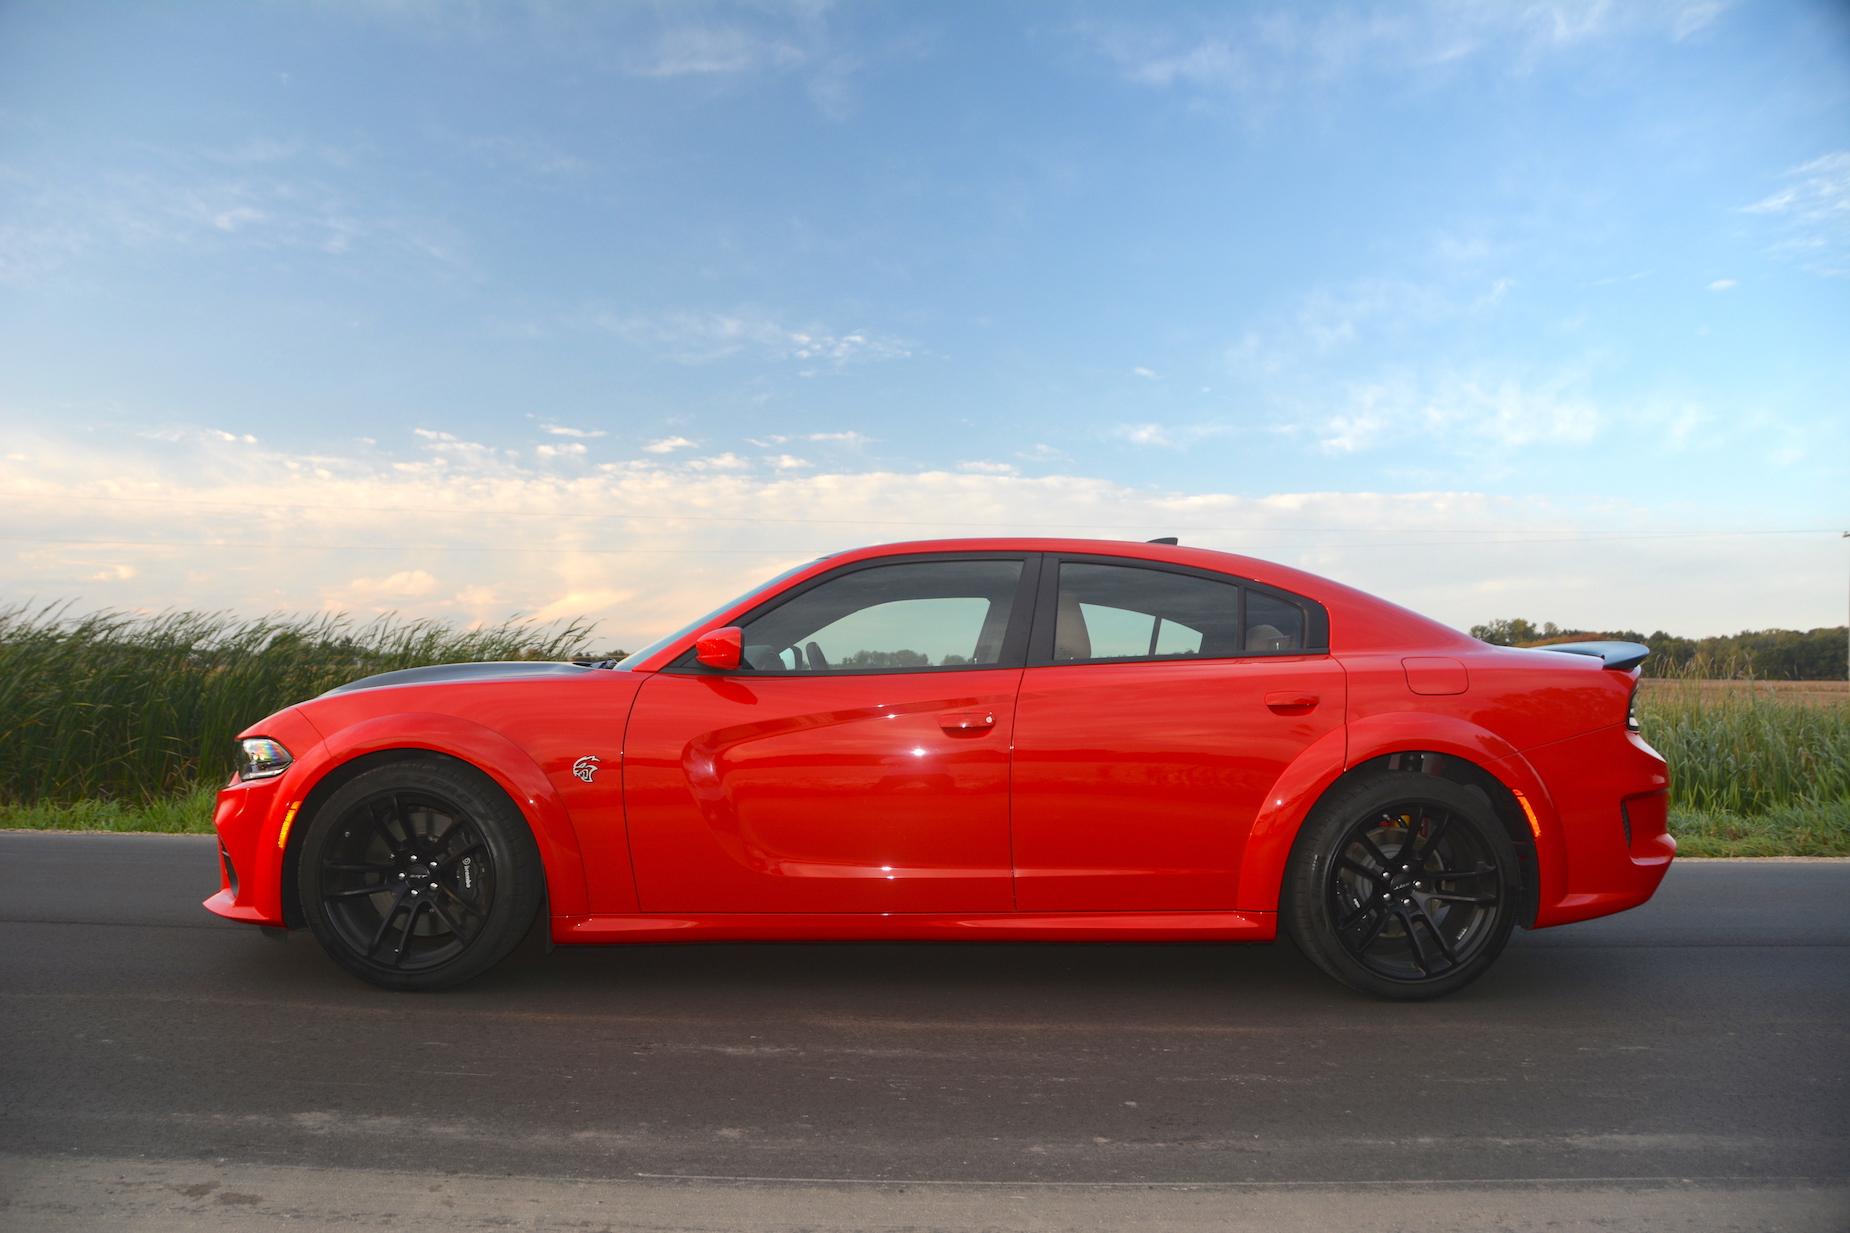 Dodge Charger SRT Hellcat Widebody Side